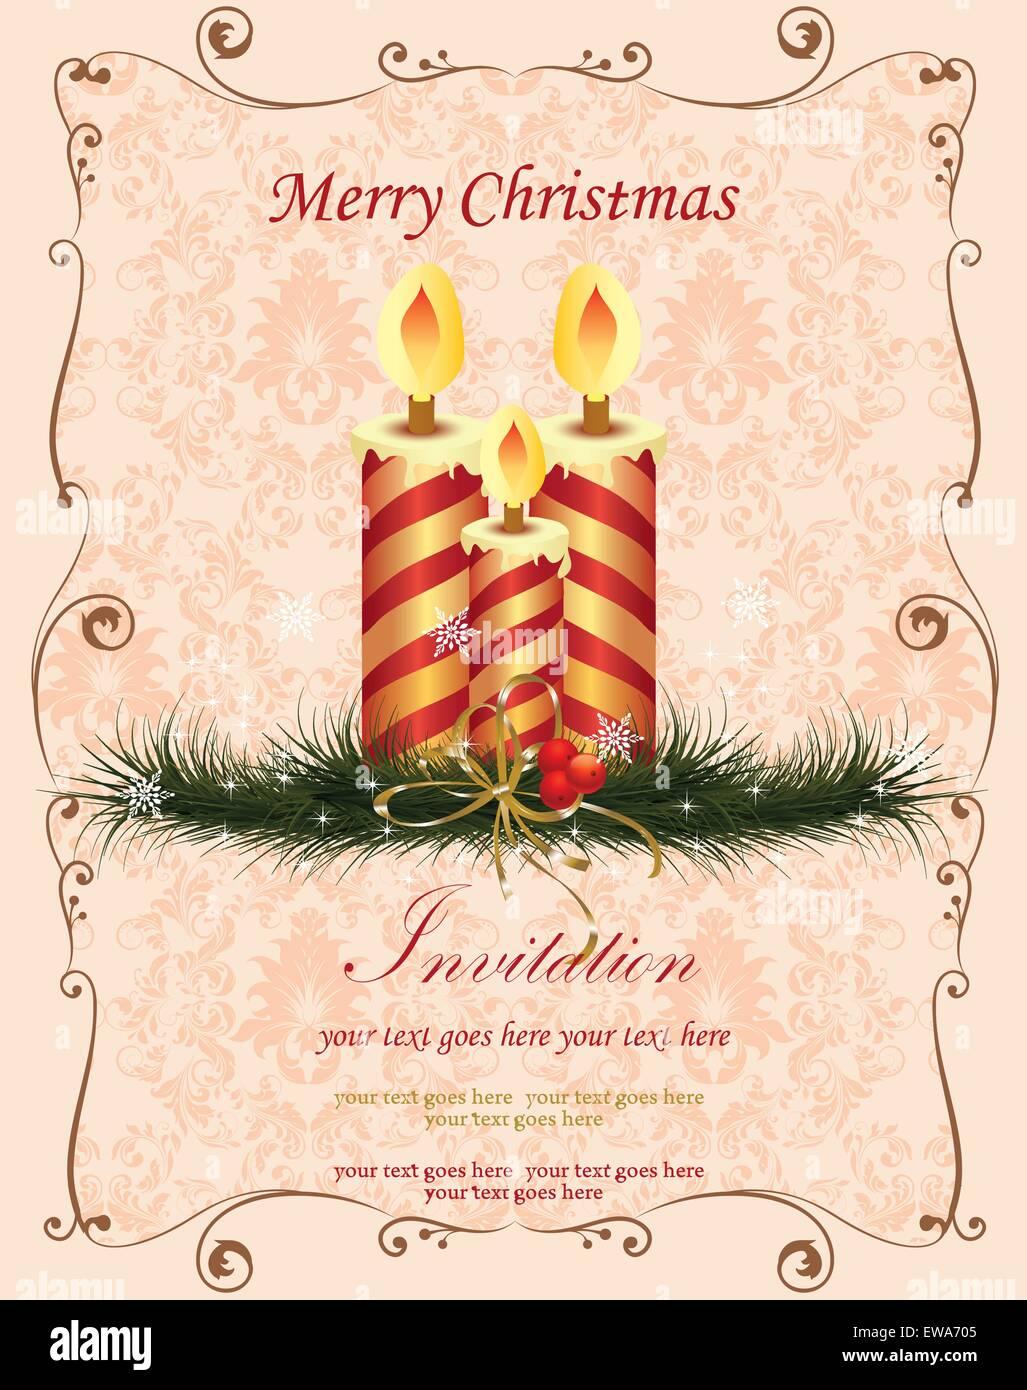 Vintage christmas card with ornate elegant retro abstract floral vintage christmas card with ornate elegant retro abstract floral design red and gold striped candles on light orange pink m4hsunfo